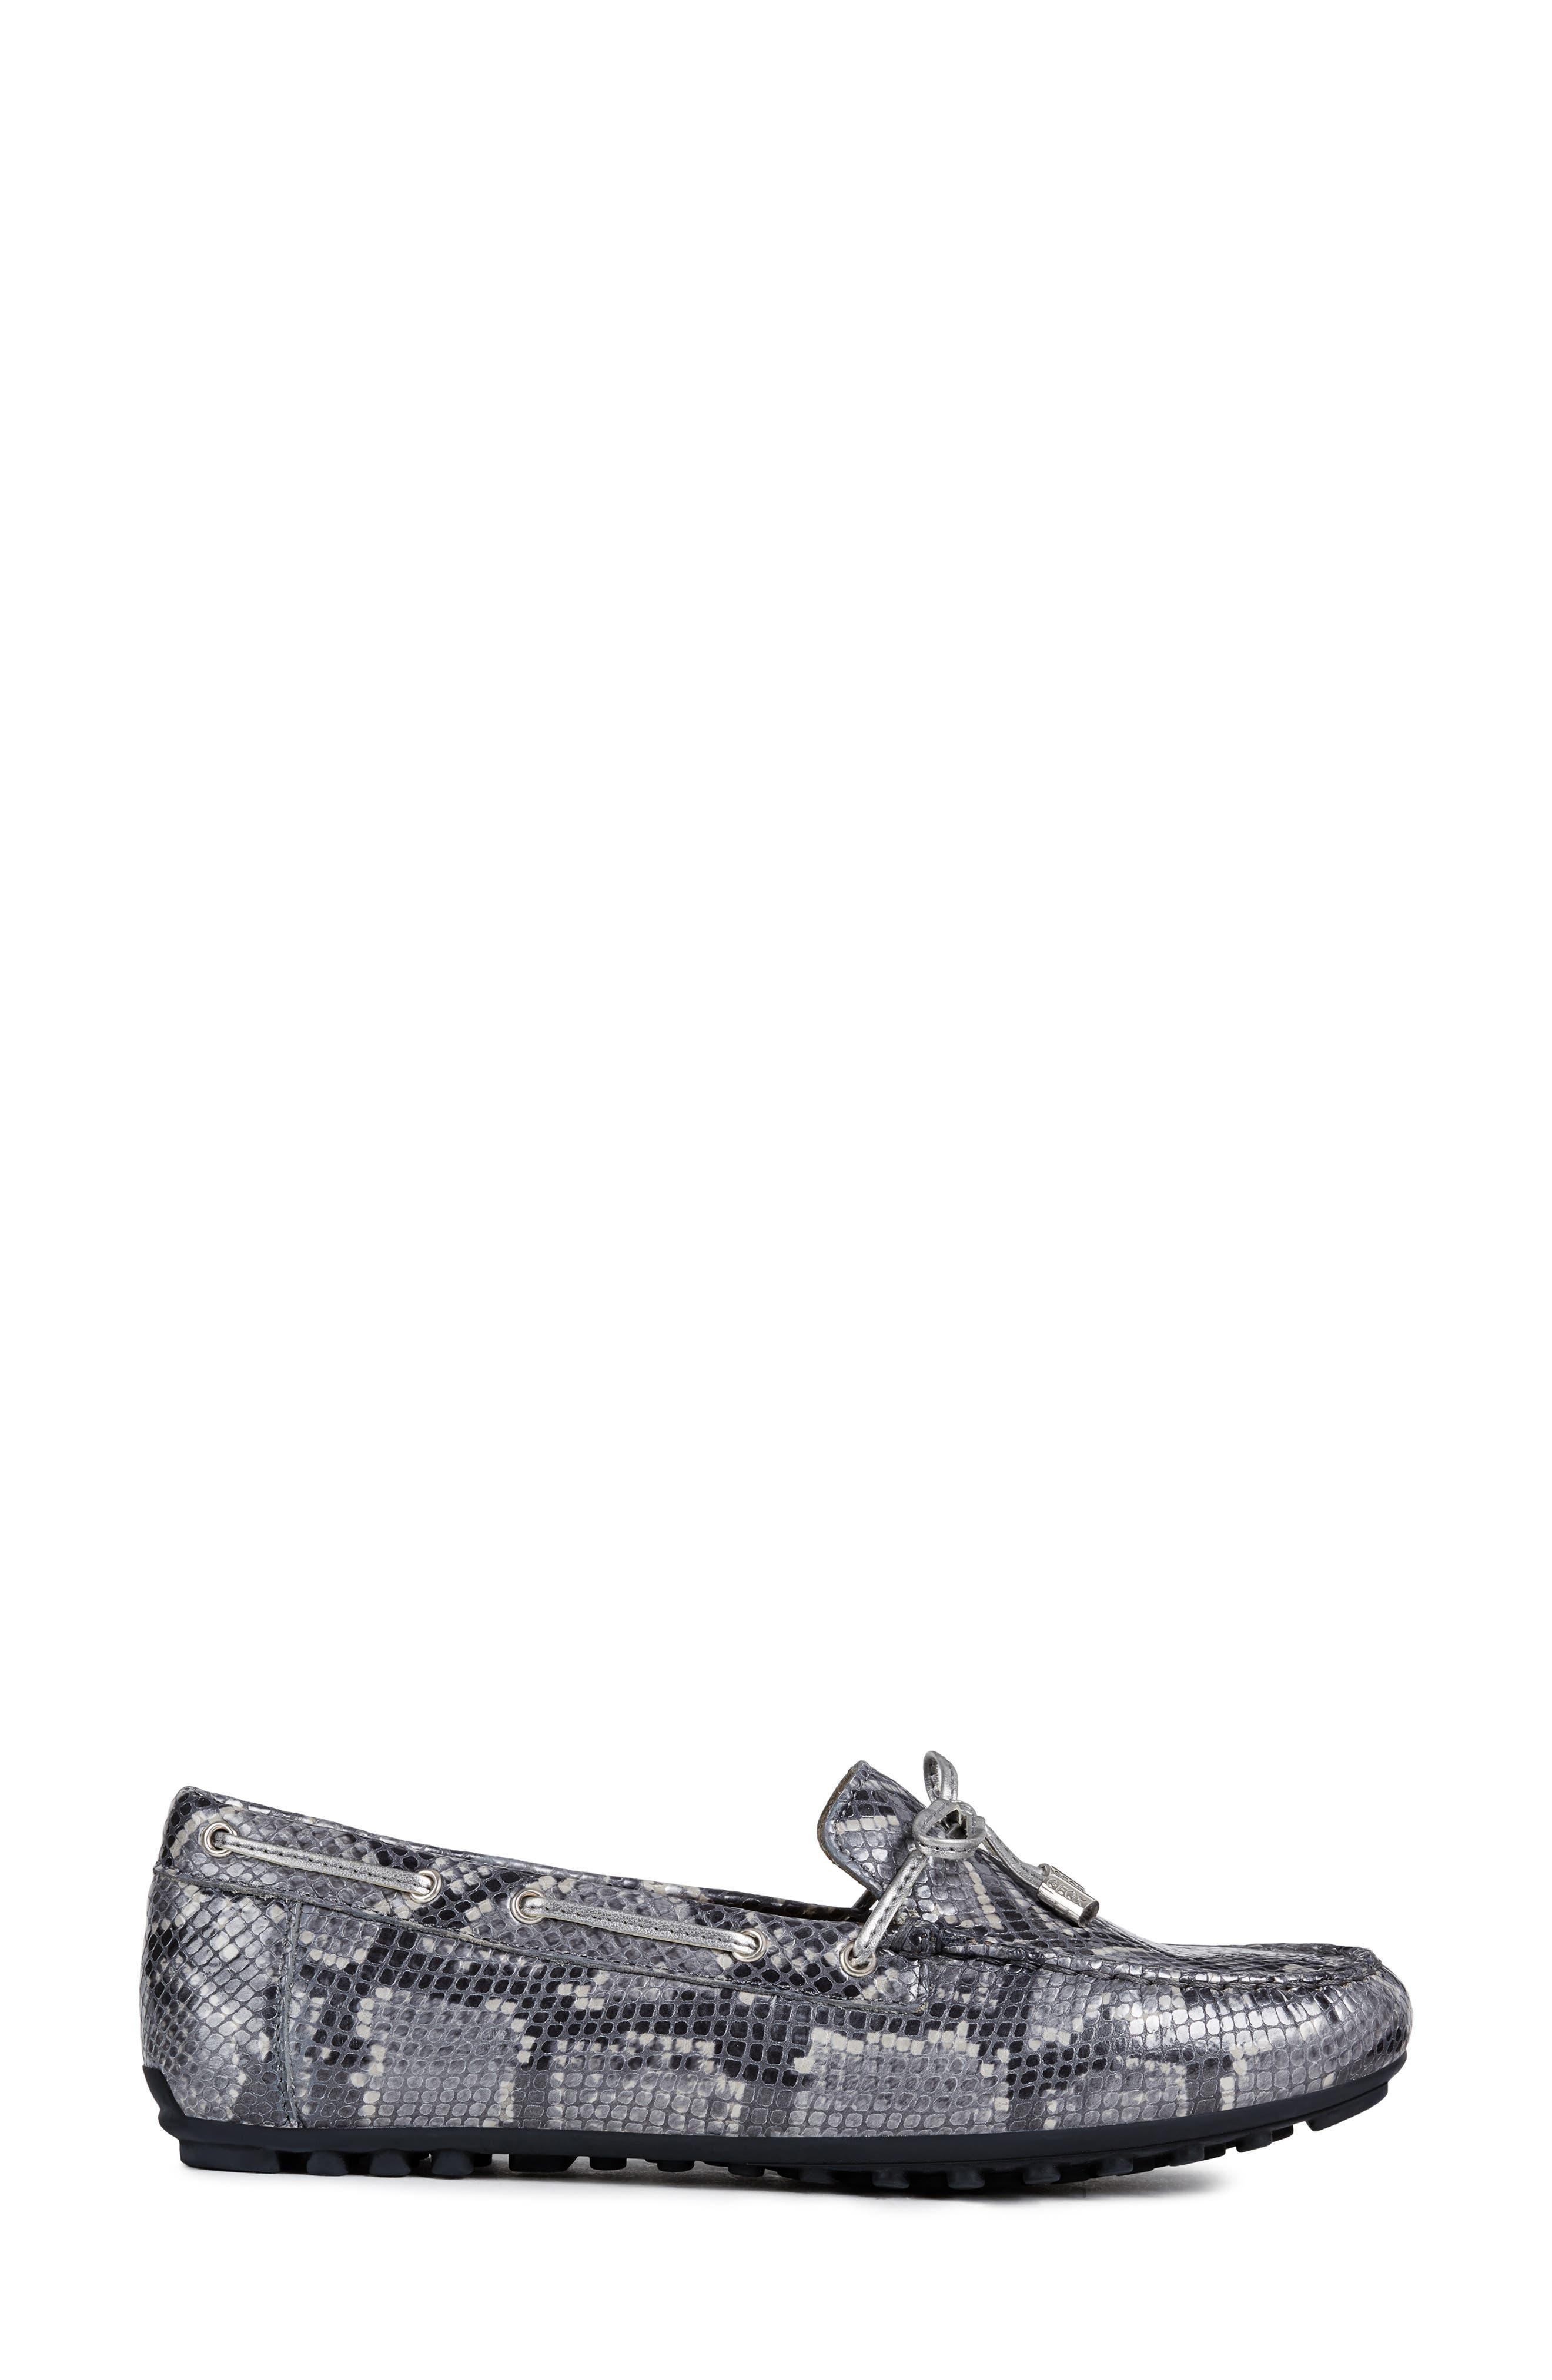 Leelyan Leather Loafer,                             Alternate thumbnail 3, color,                             LIGHT GREY/ GUNMETAL LEATHER